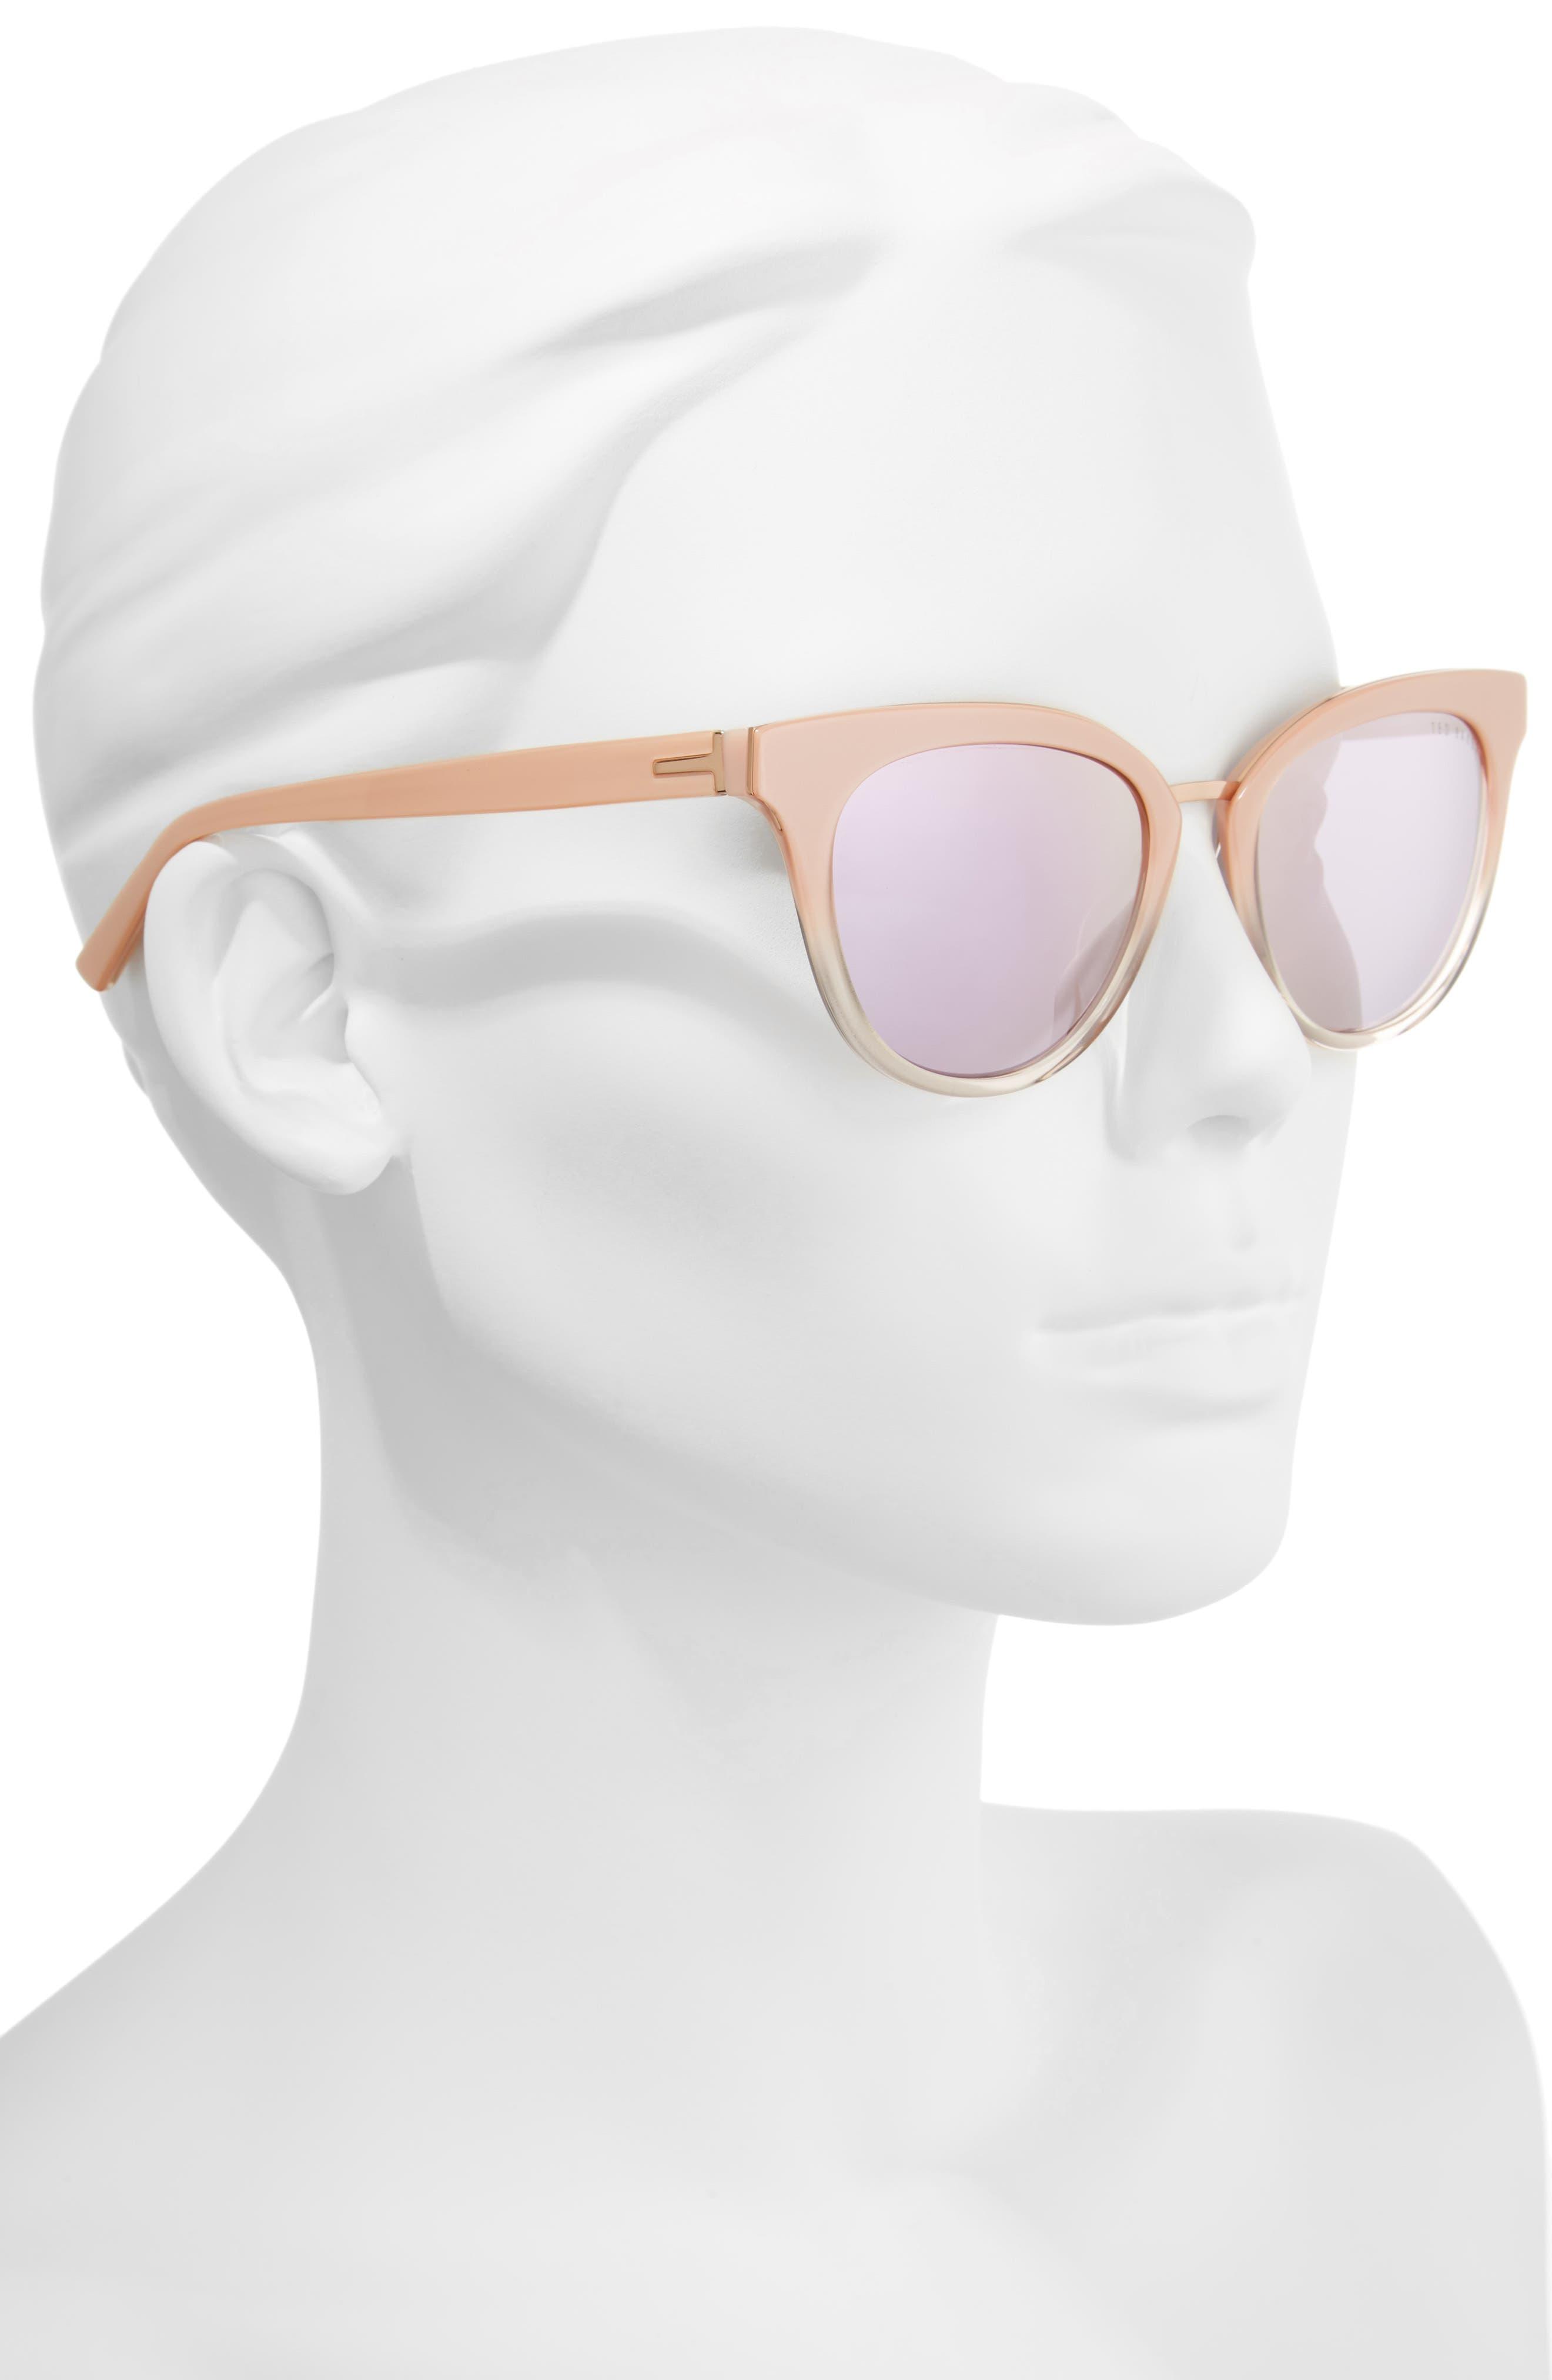 53mm Cat Eye Sunglasses,                             Alternate thumbnail 2, color,                             Blush